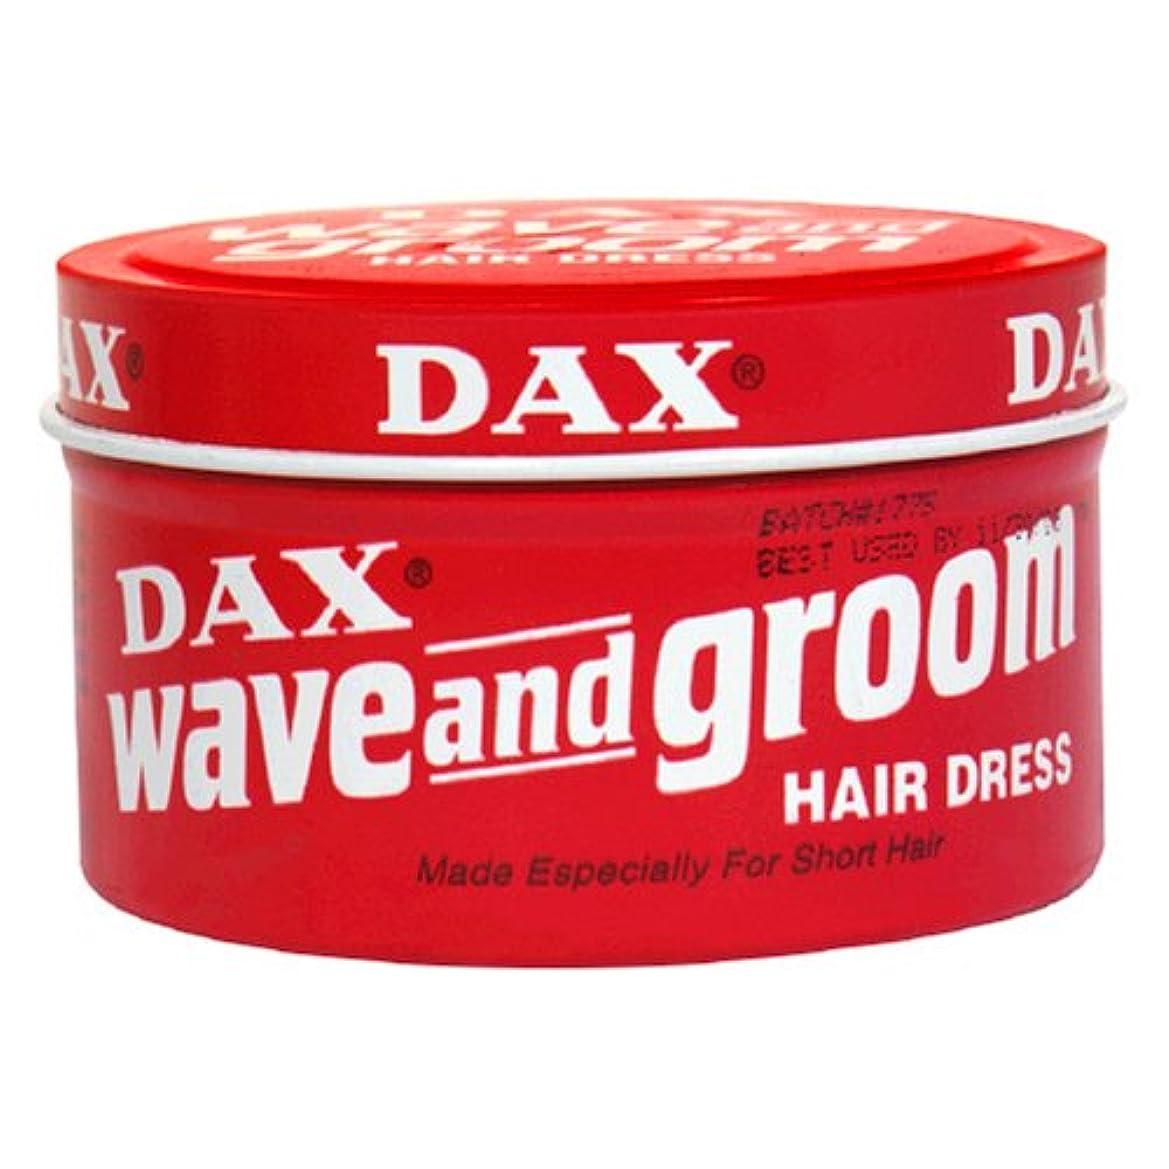 狭い繁栄弁護士Dax Wave & Groom Hair Dress 99 gm Jar (Case of 6) (並行輸入品)